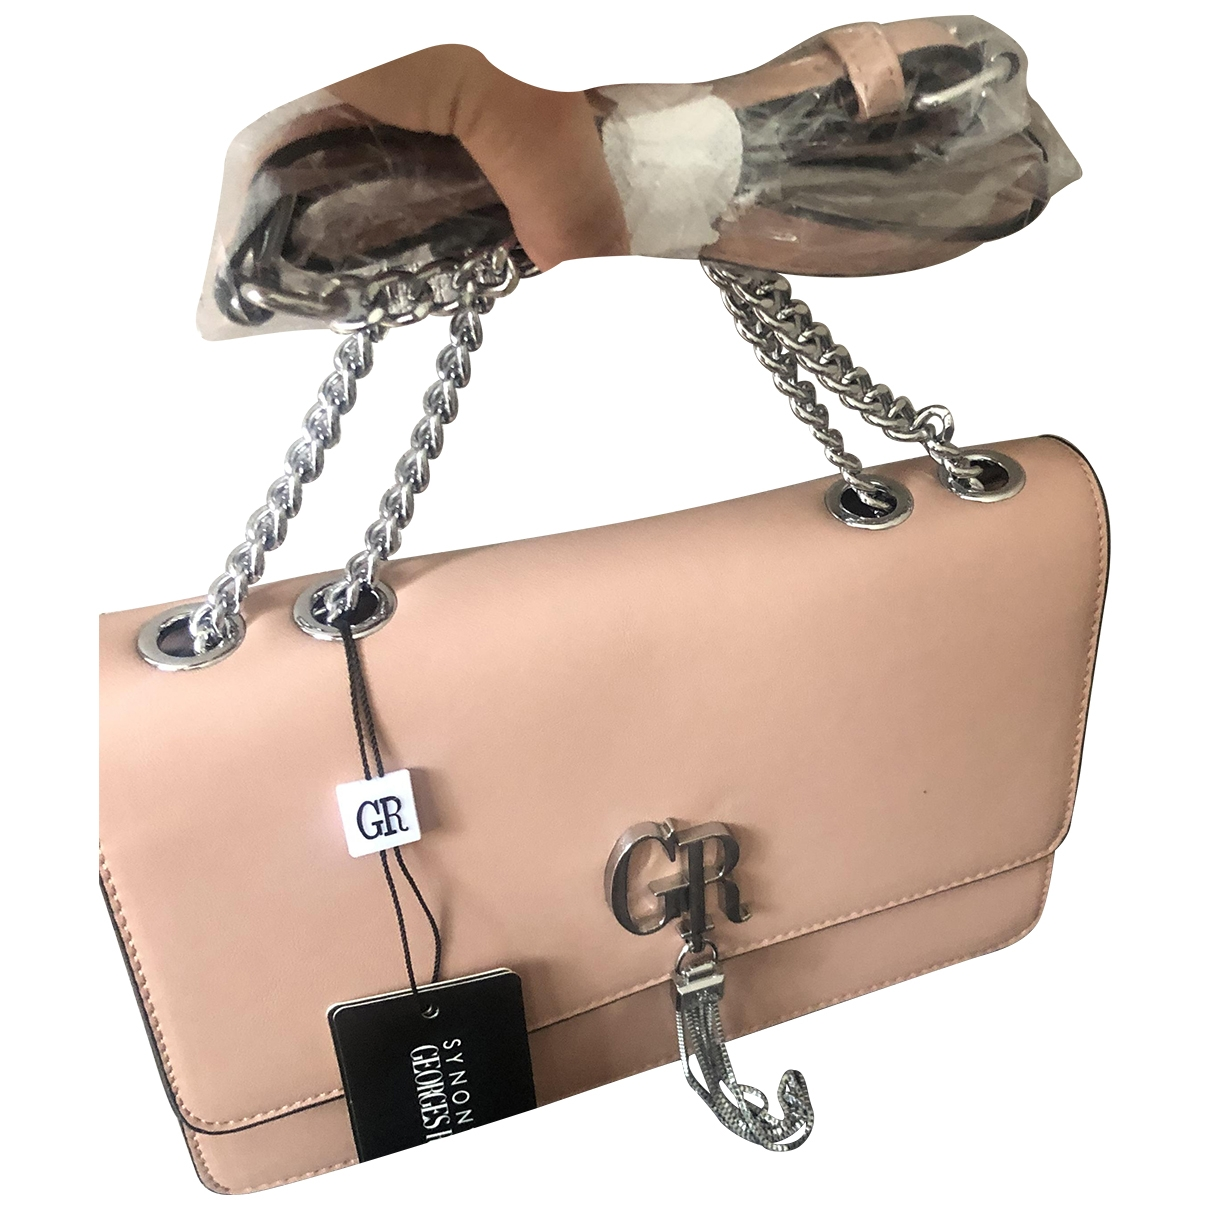 Georges Rech \N Pink handbag for Women \N